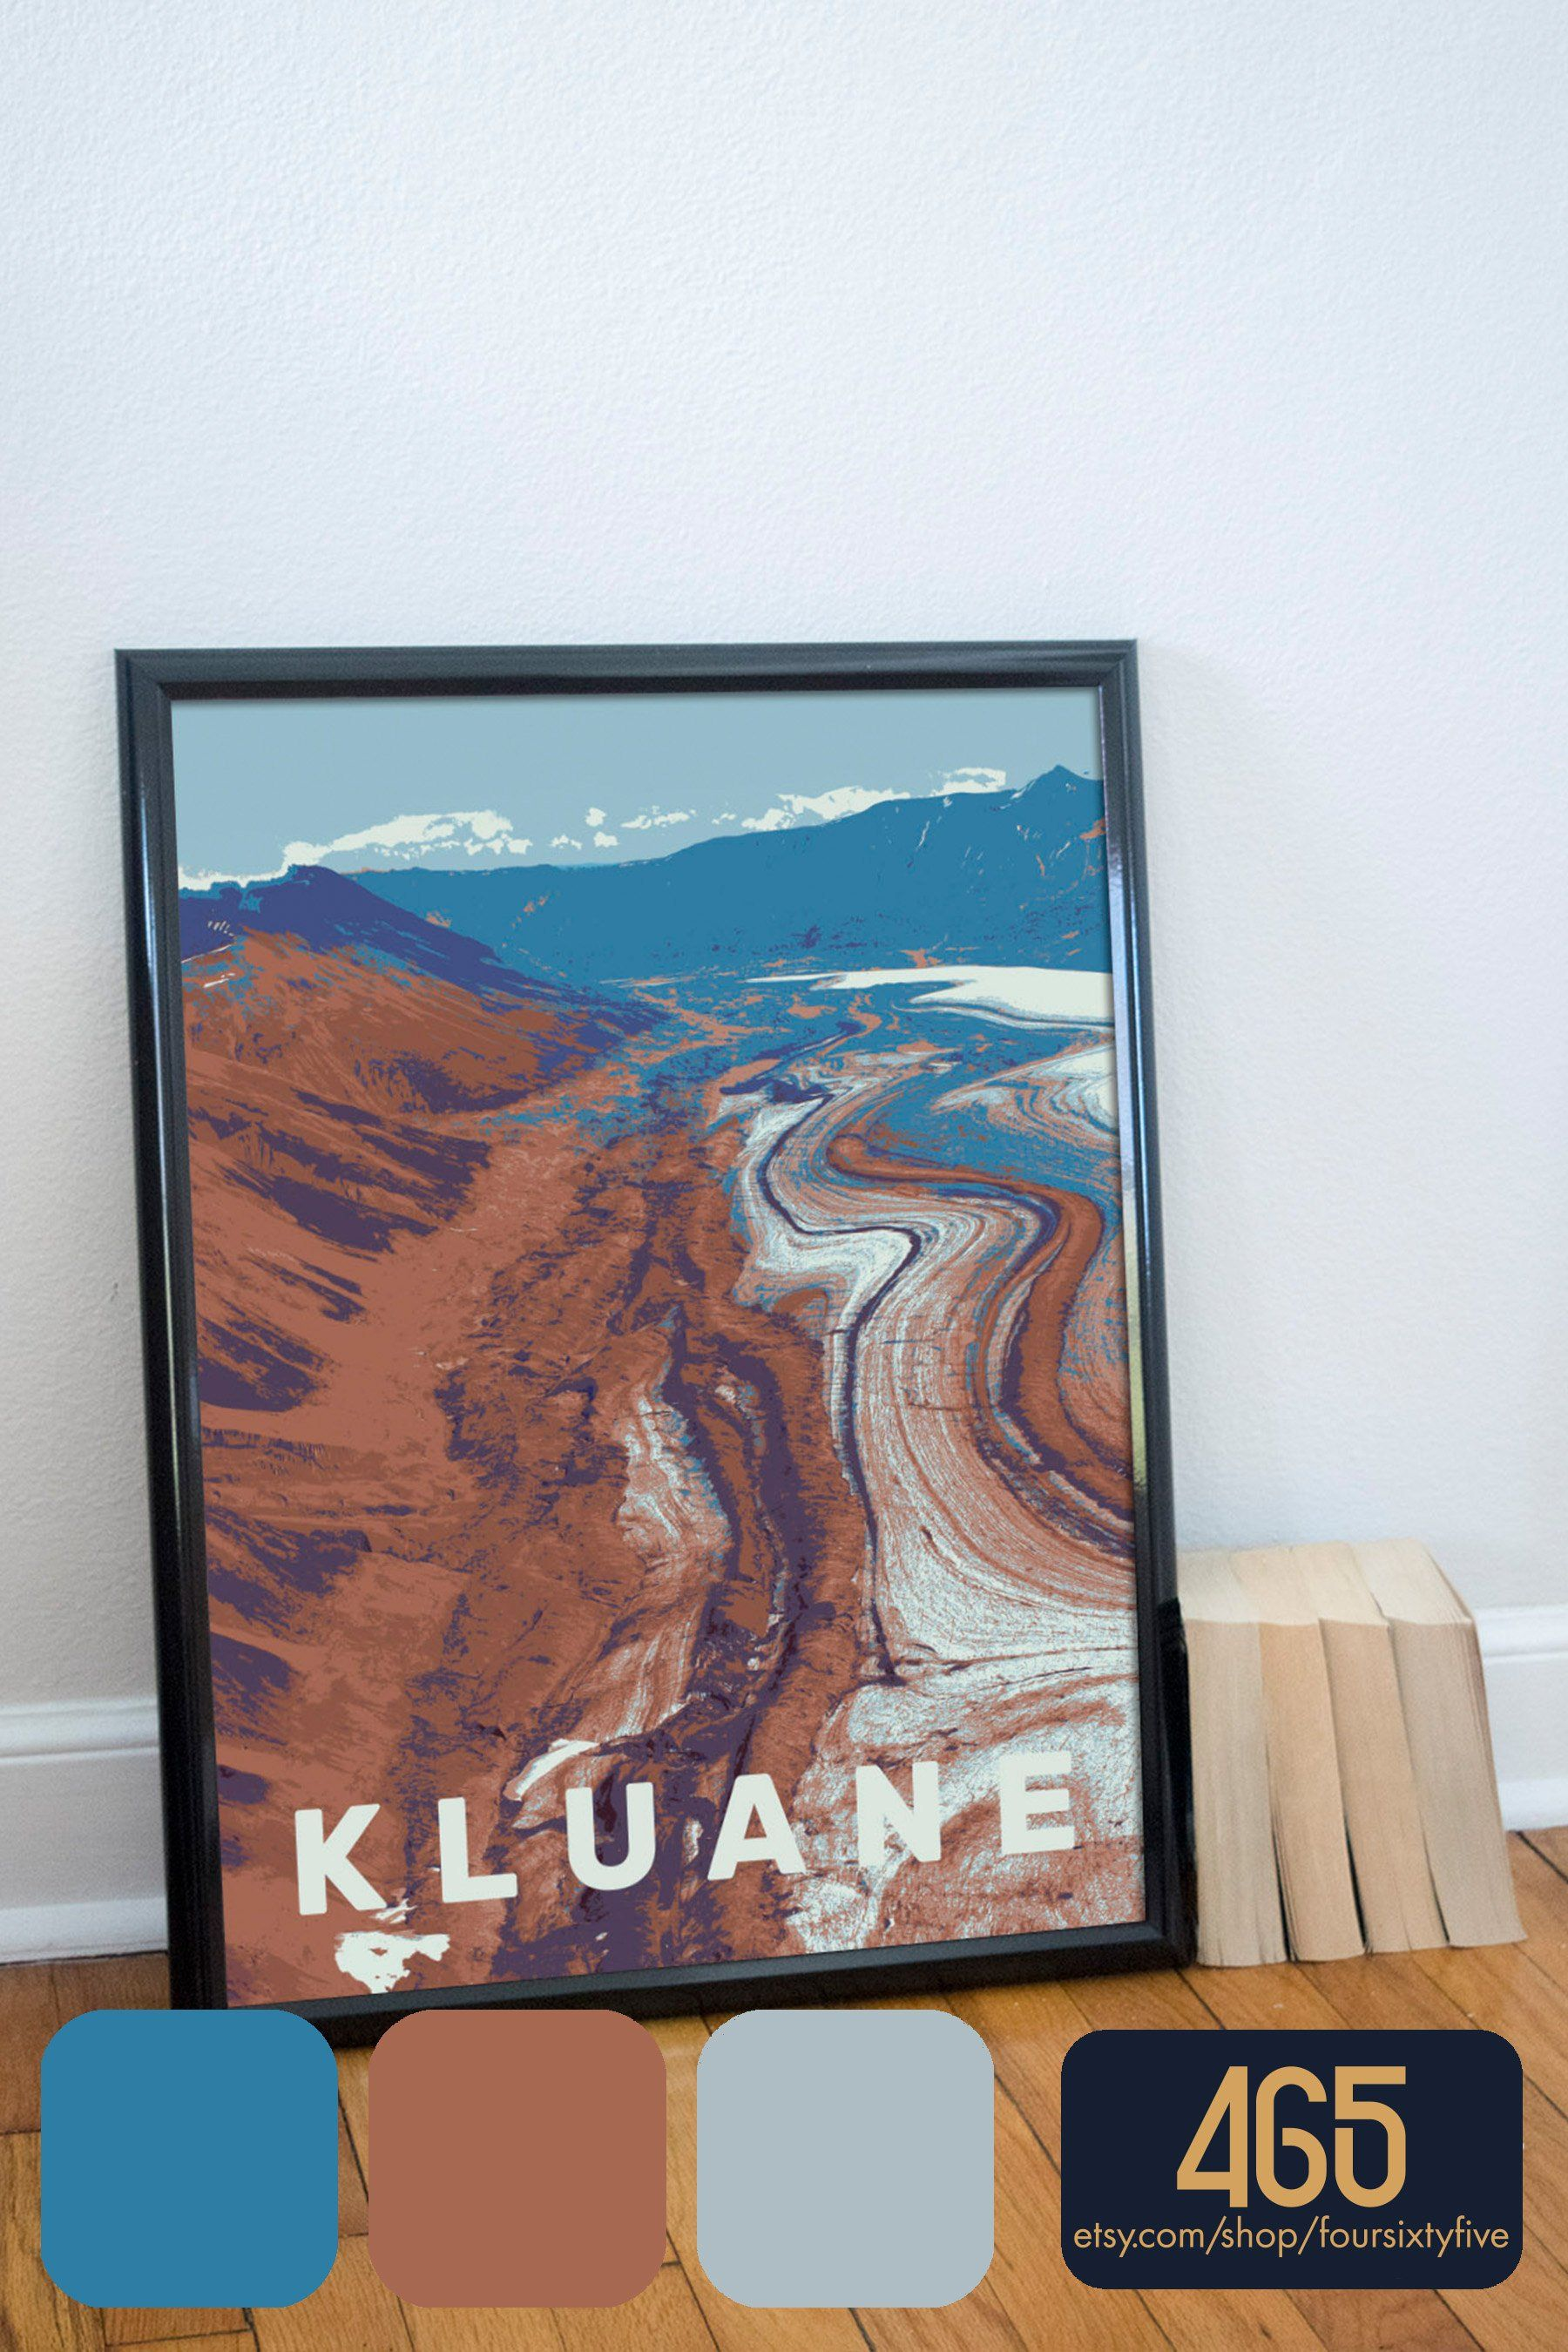 Kluane National Park Canada Poster Etsy In 2020 Canada National Parks Kluane National Park National Parks